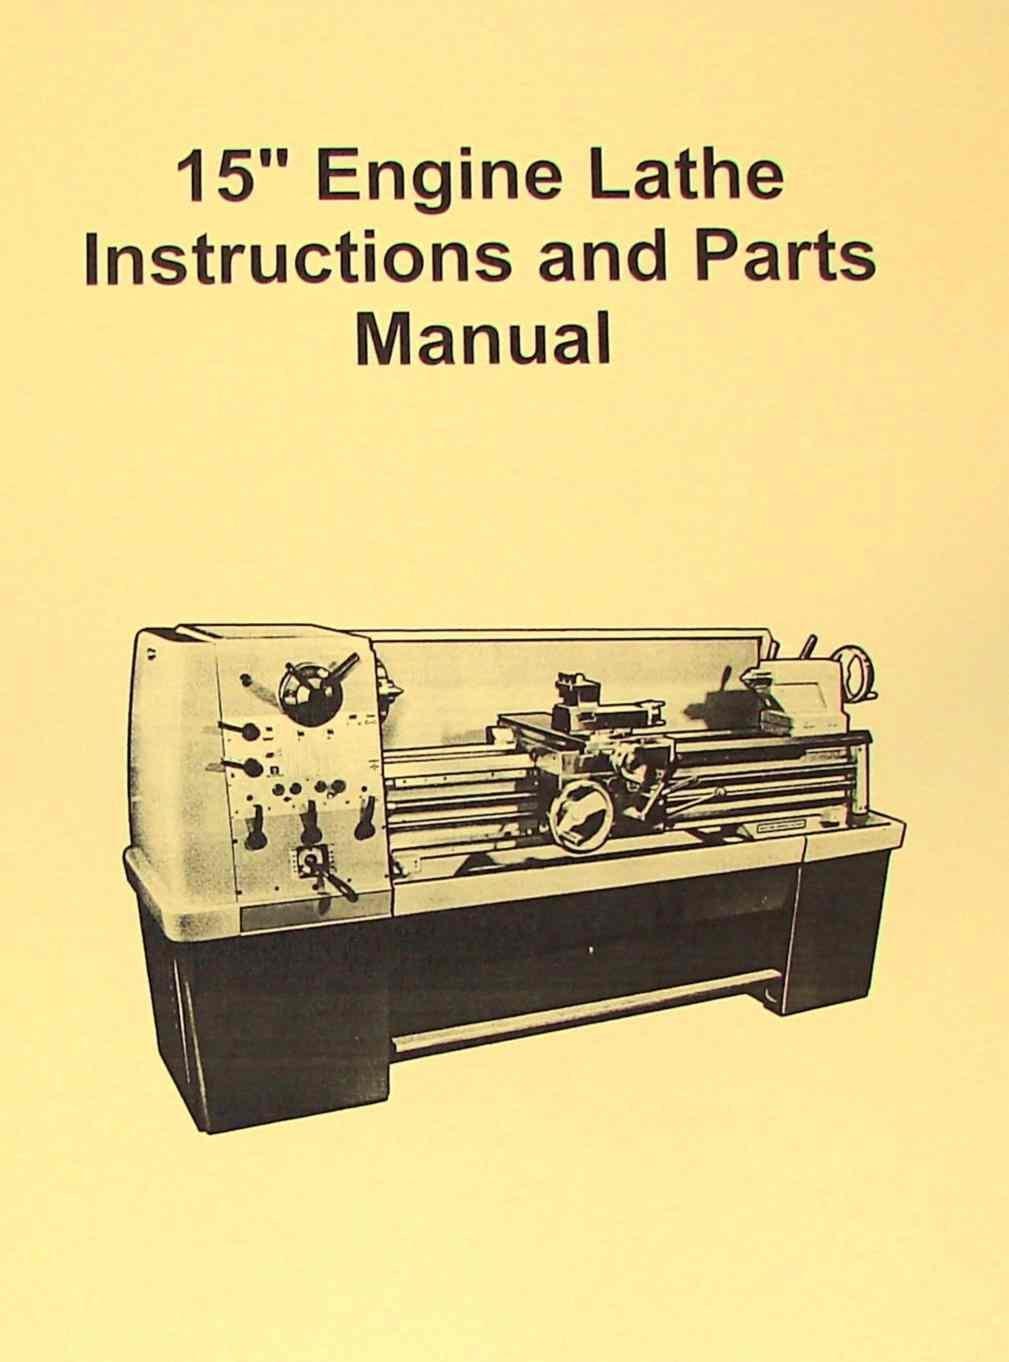 "JET-Asian 1550(D) 15"" Metal Lathe Operator's & Parts Manual: Misc.:  Amazon.com: Books"